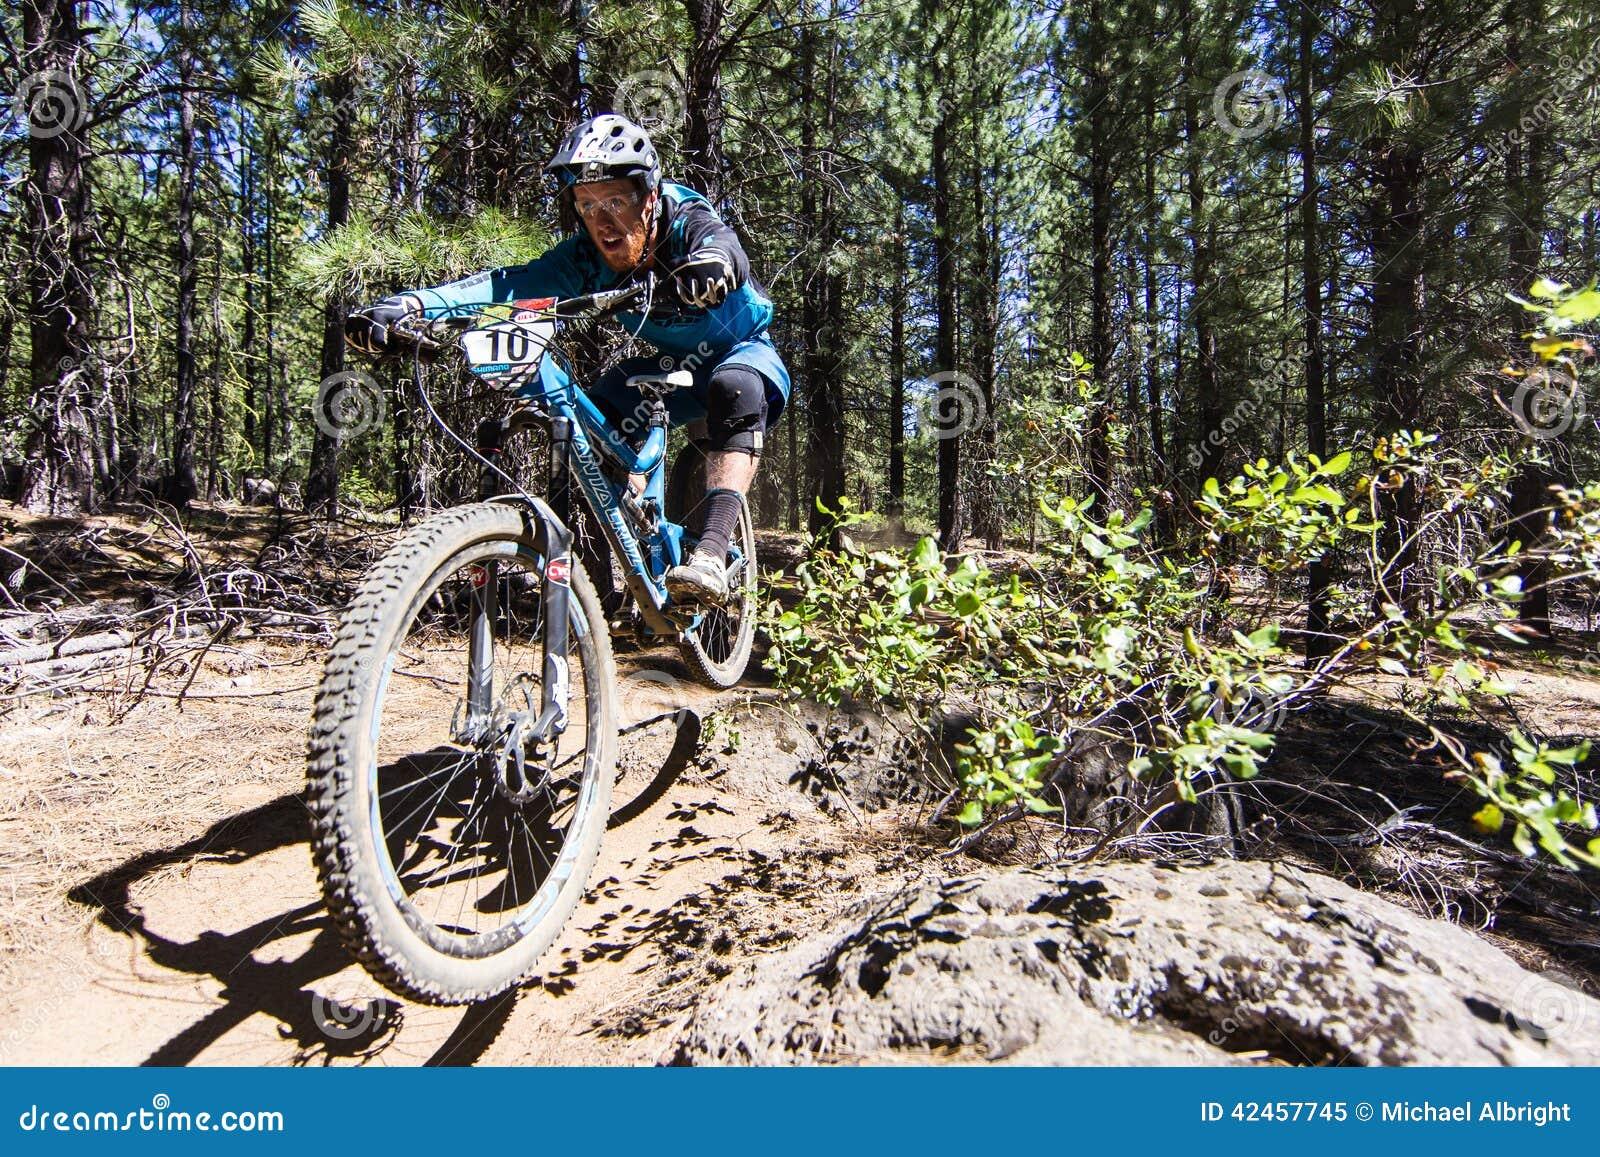 Oregon Enduro #2 - Biegung